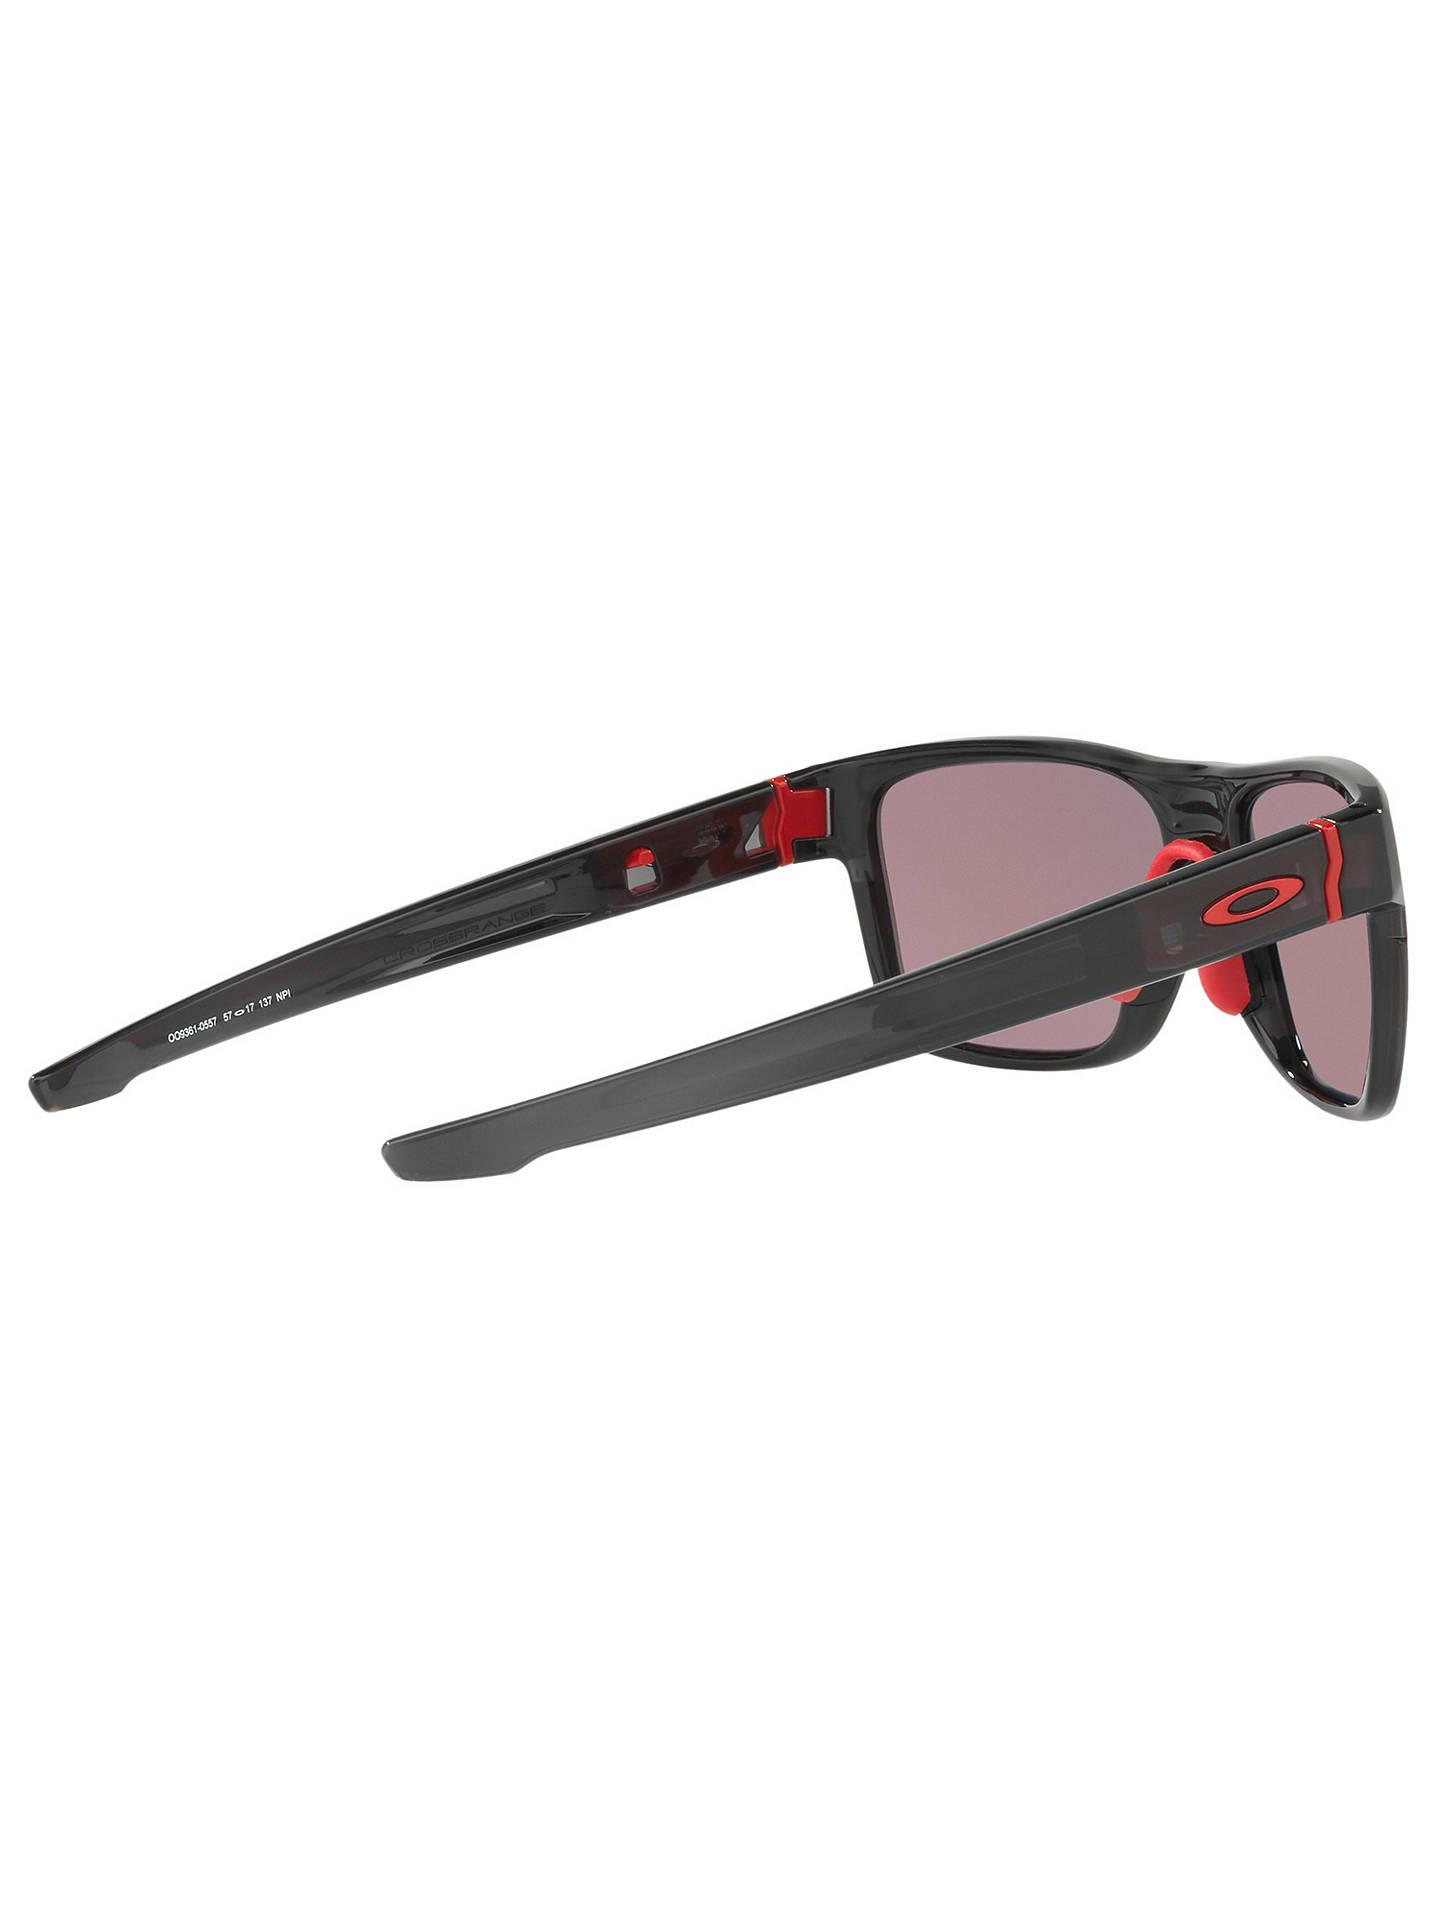 9de597cad62 Oakley OO9361 Crossrange Prizm Polarised Square Sunglasses at John ...